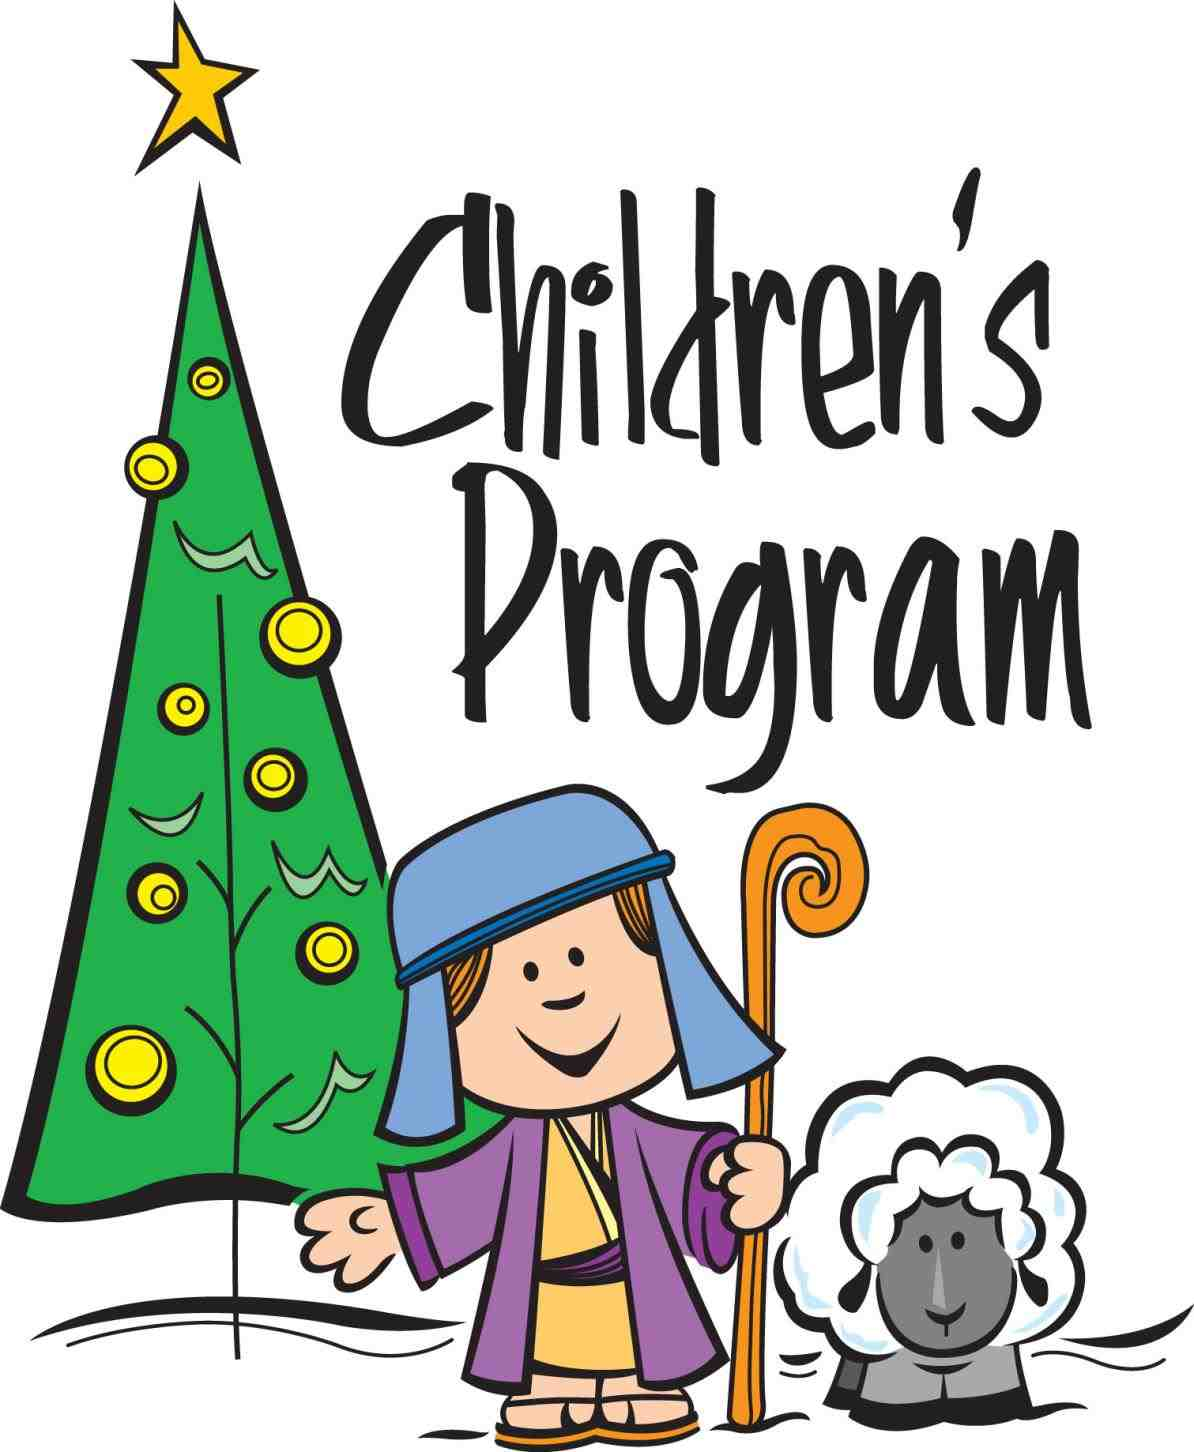 1194x1452 Free Religious Christmas Clip Art Cheminee.website